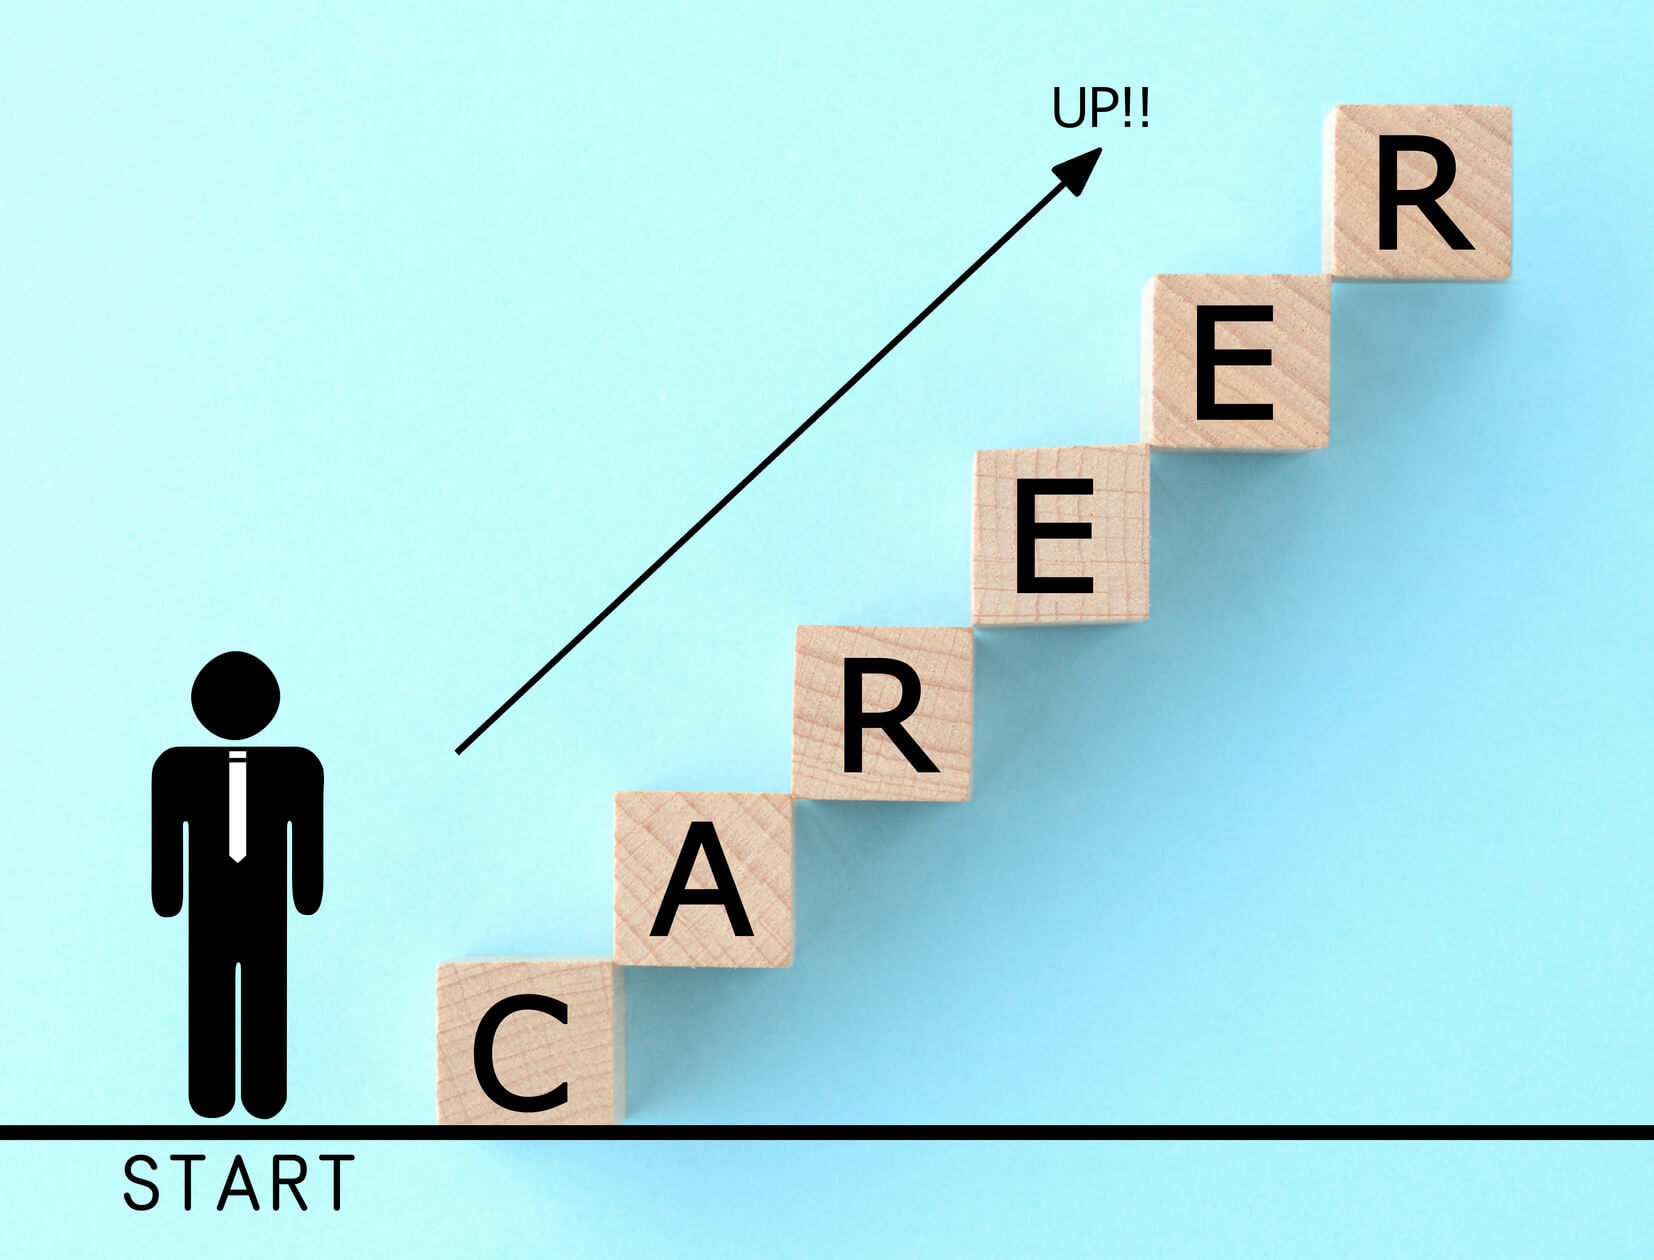 IT初心者におすすめの資格とは?転職や年収への影響、難易度を解説